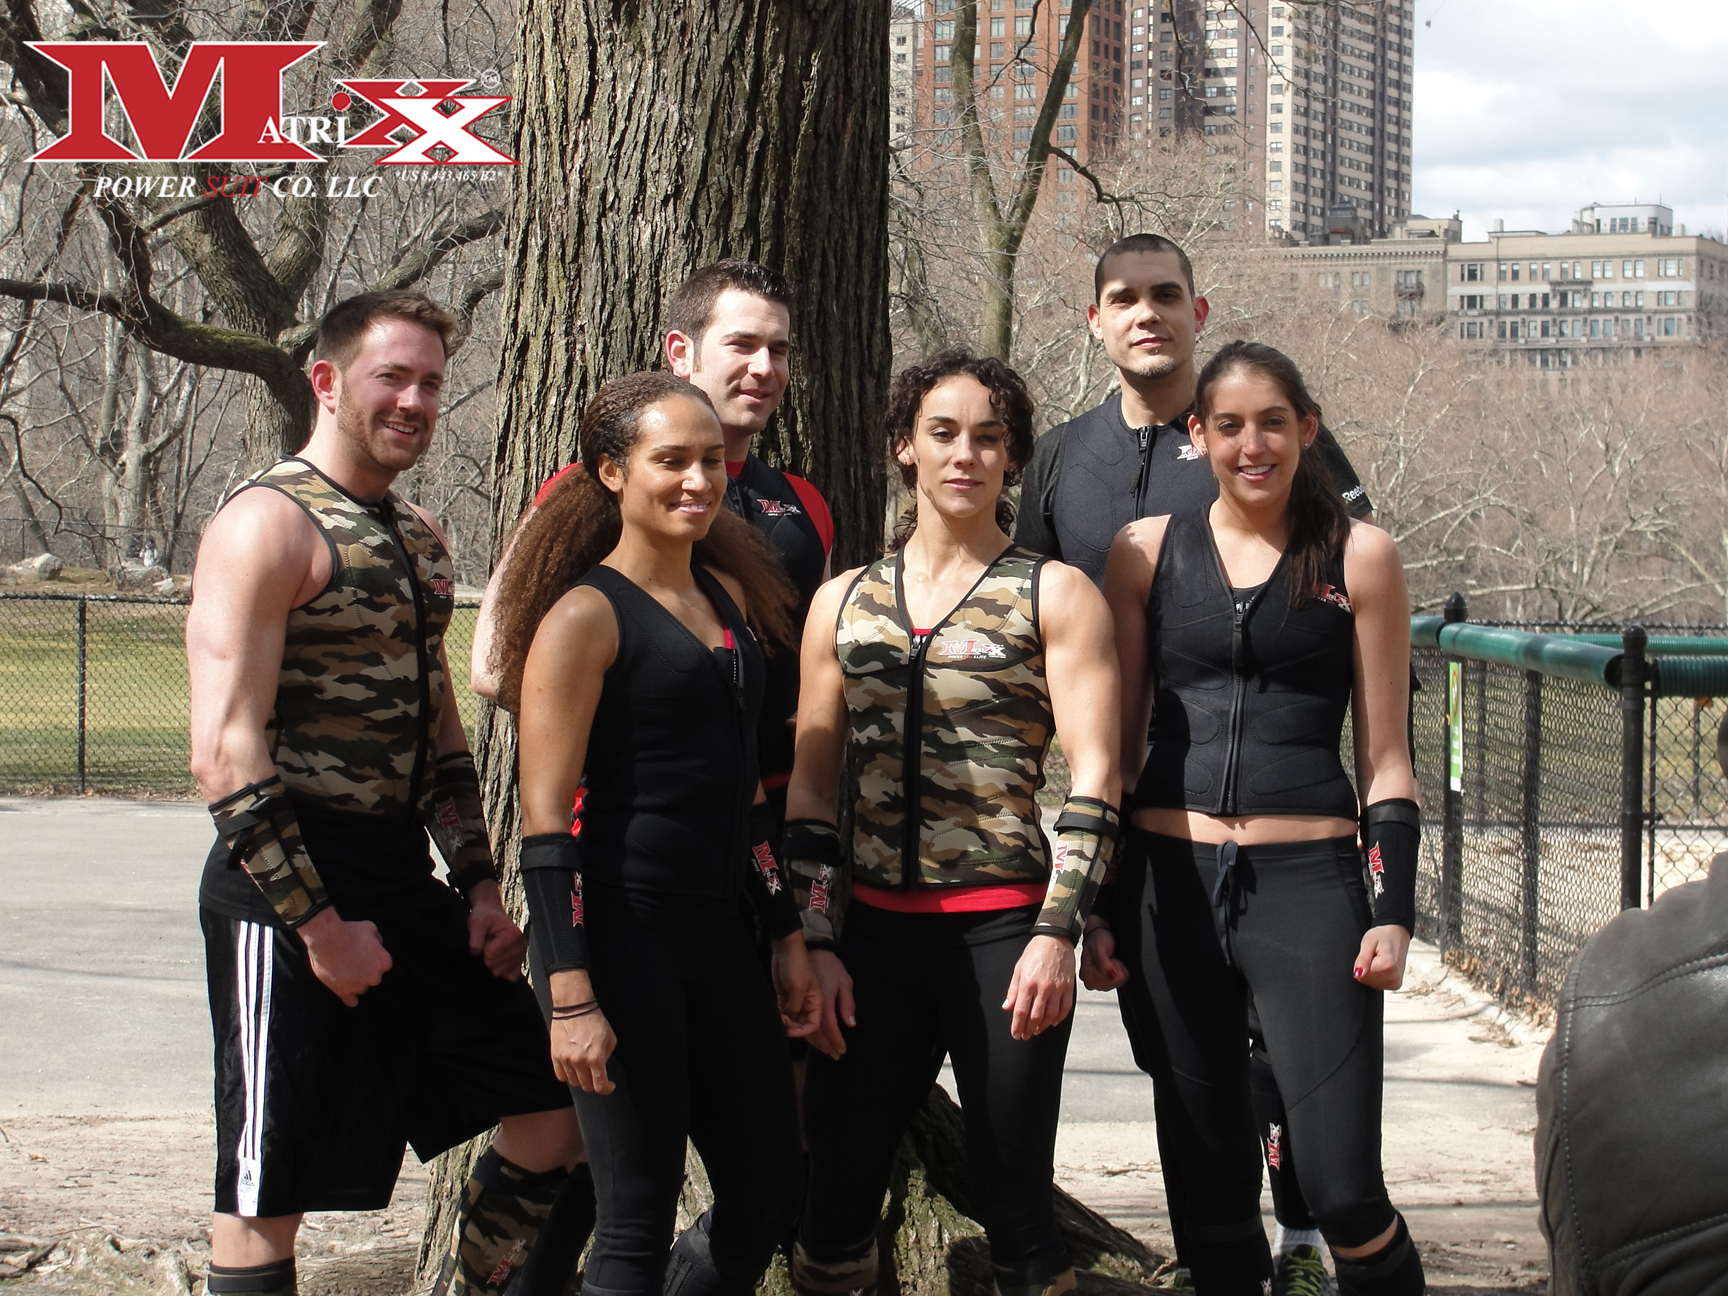 Matrixx Bootcamp in Central Park